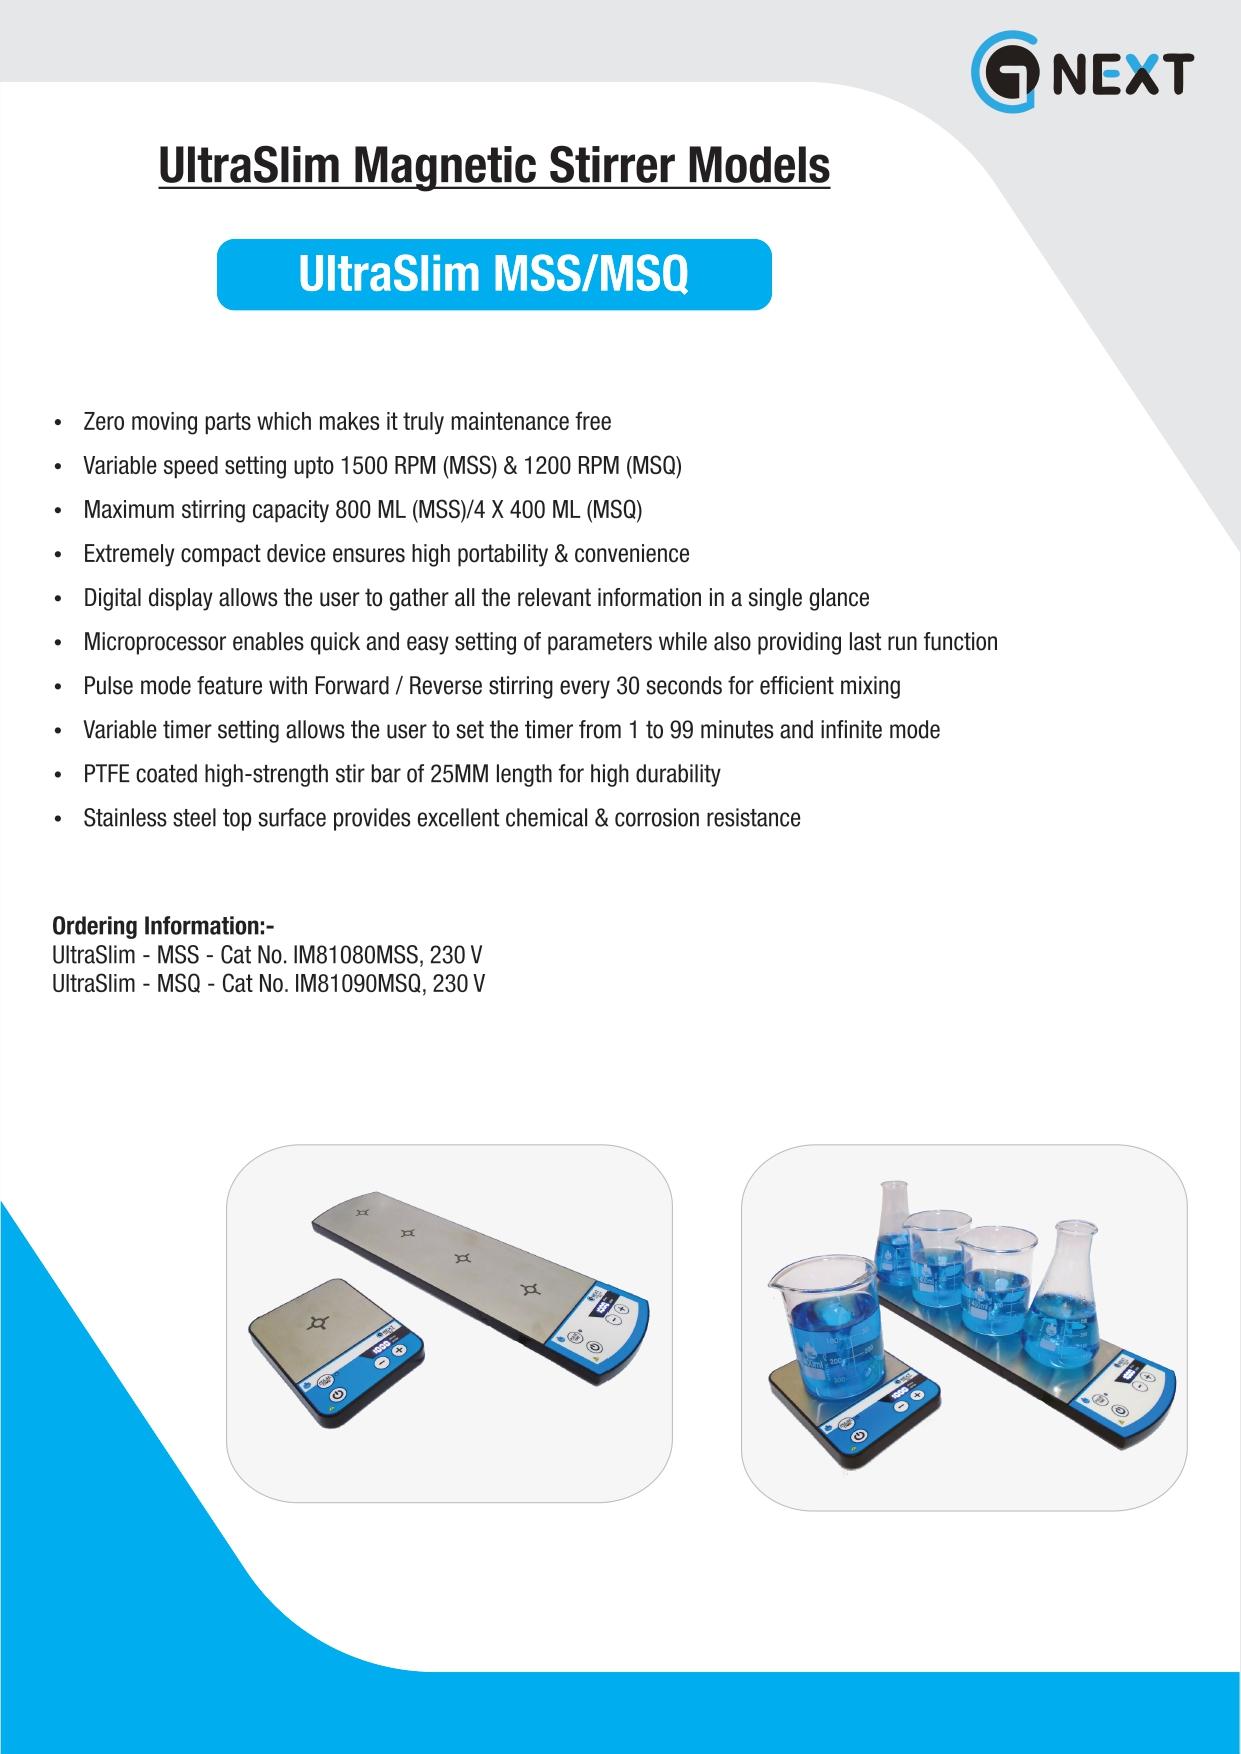 Ultra Slim Magnetic Stirrers